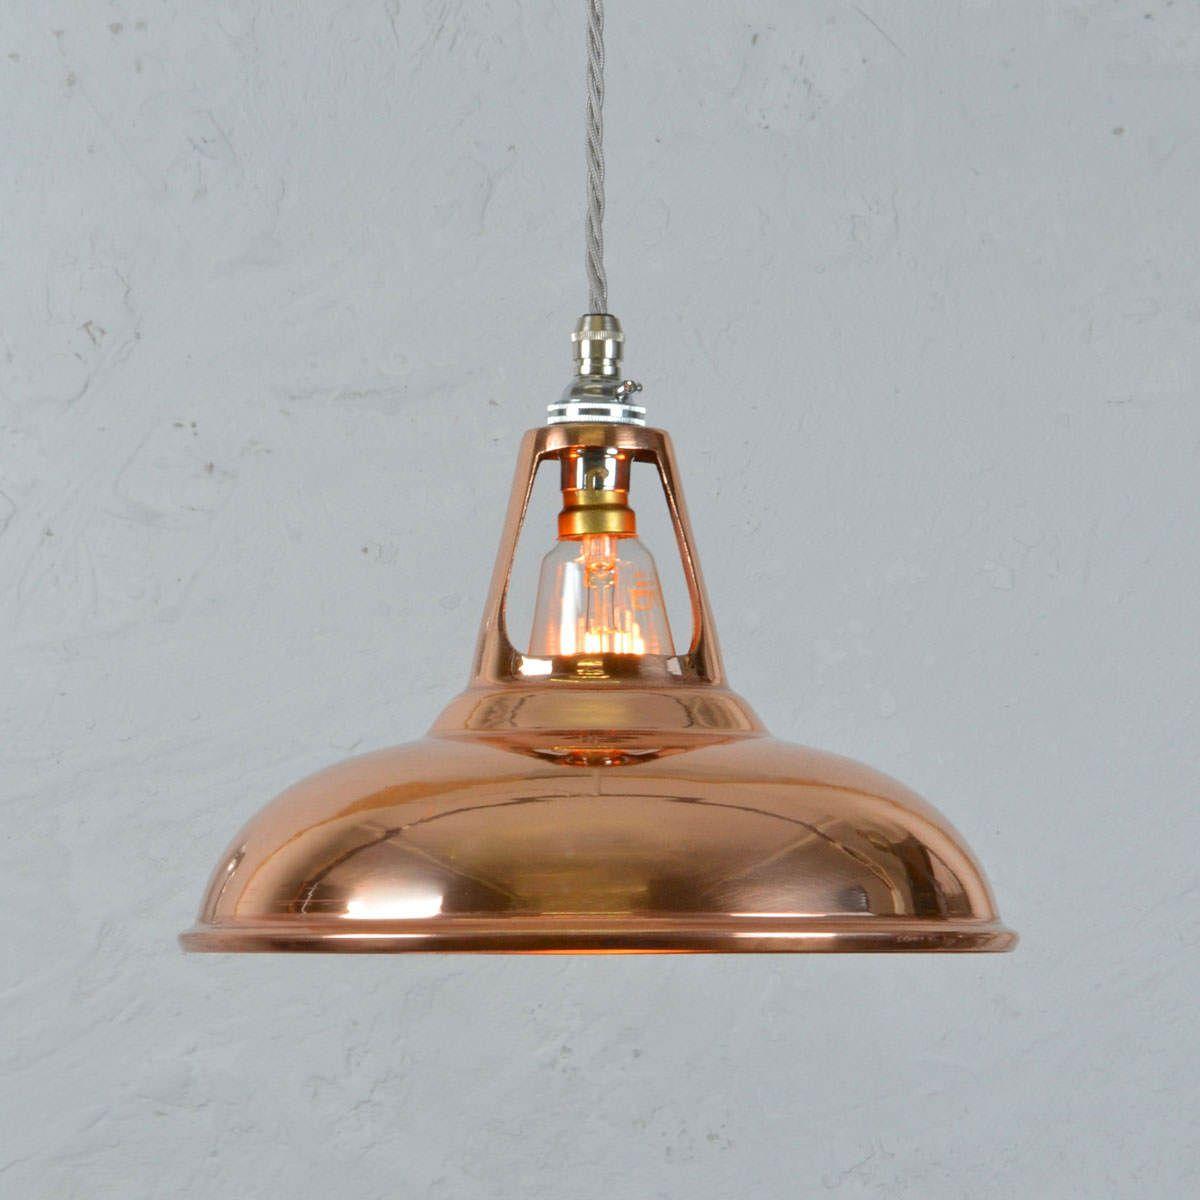 Coolicon Industrial Copper Pendant Light | Beleuchtung, Lichtlein ...